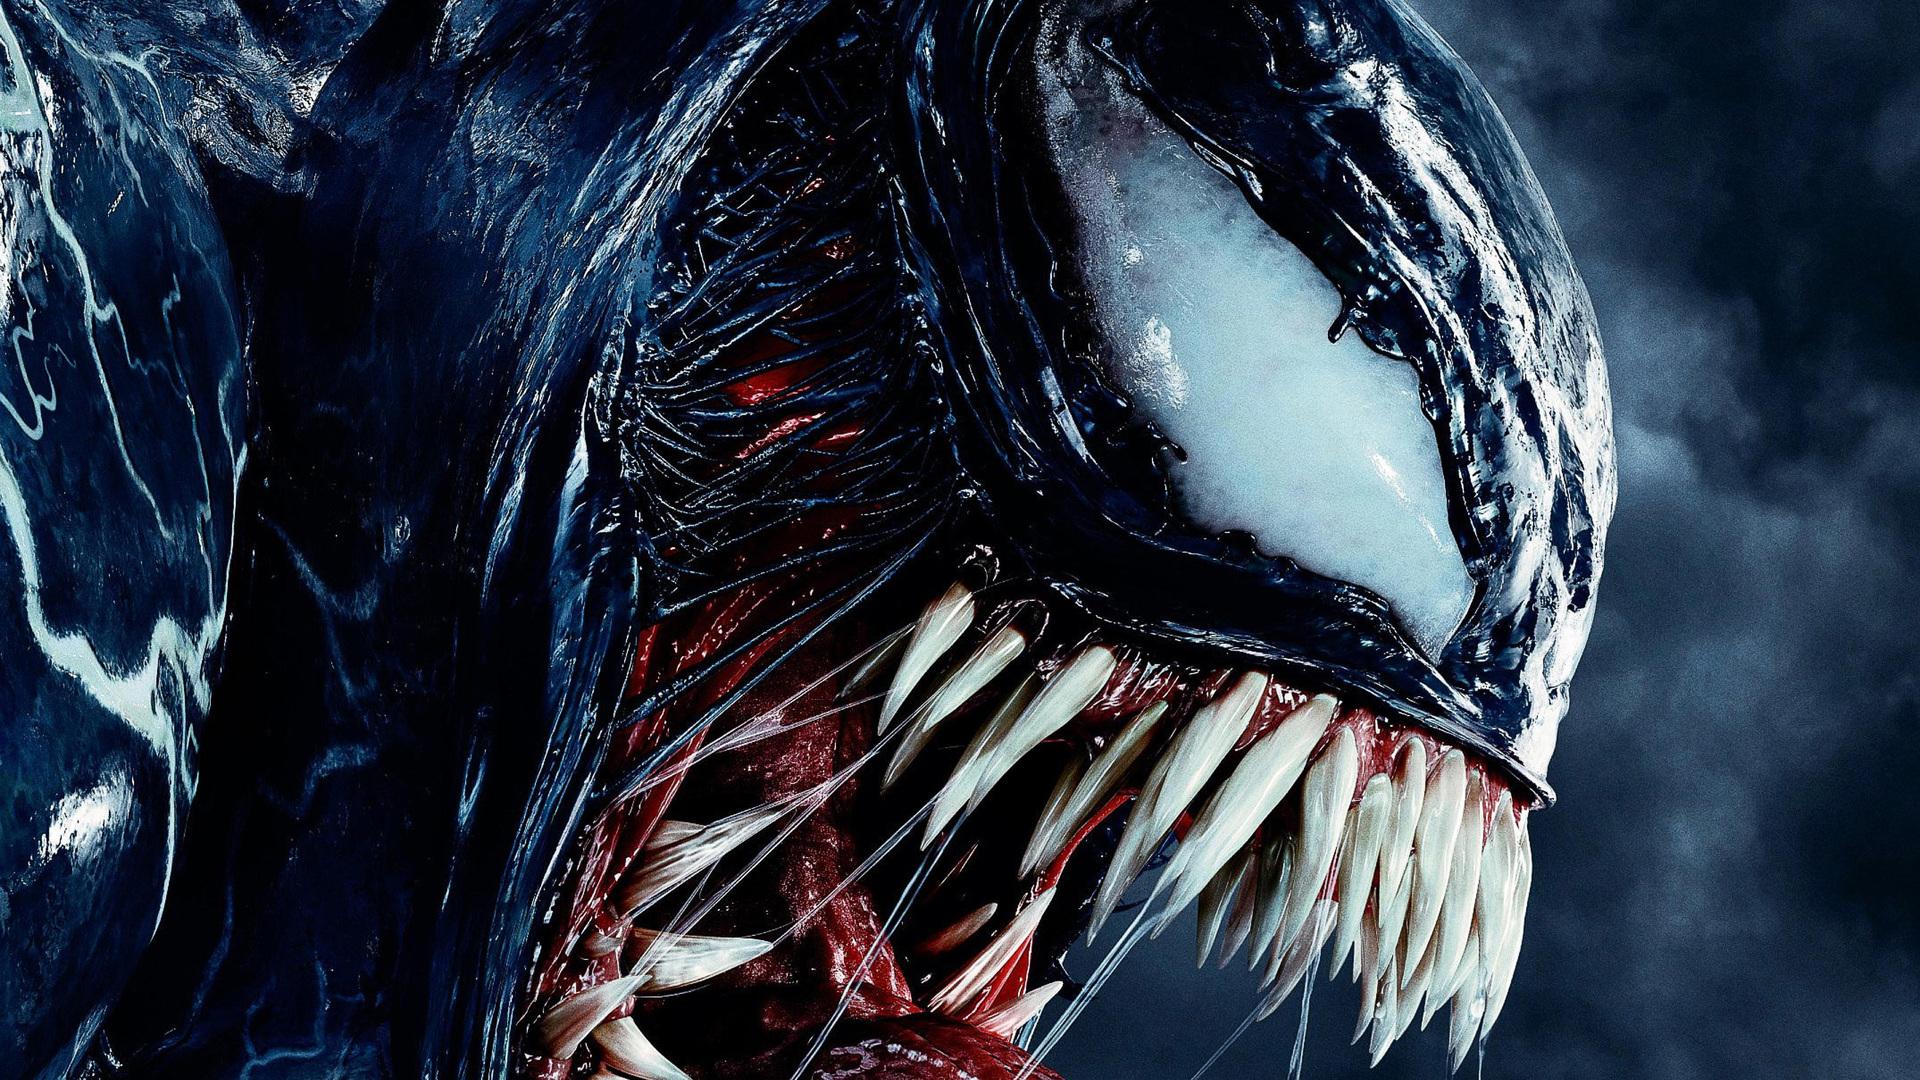 1920x1080 Venom Movie Japanese Poster Laptop Full Hd 1080p